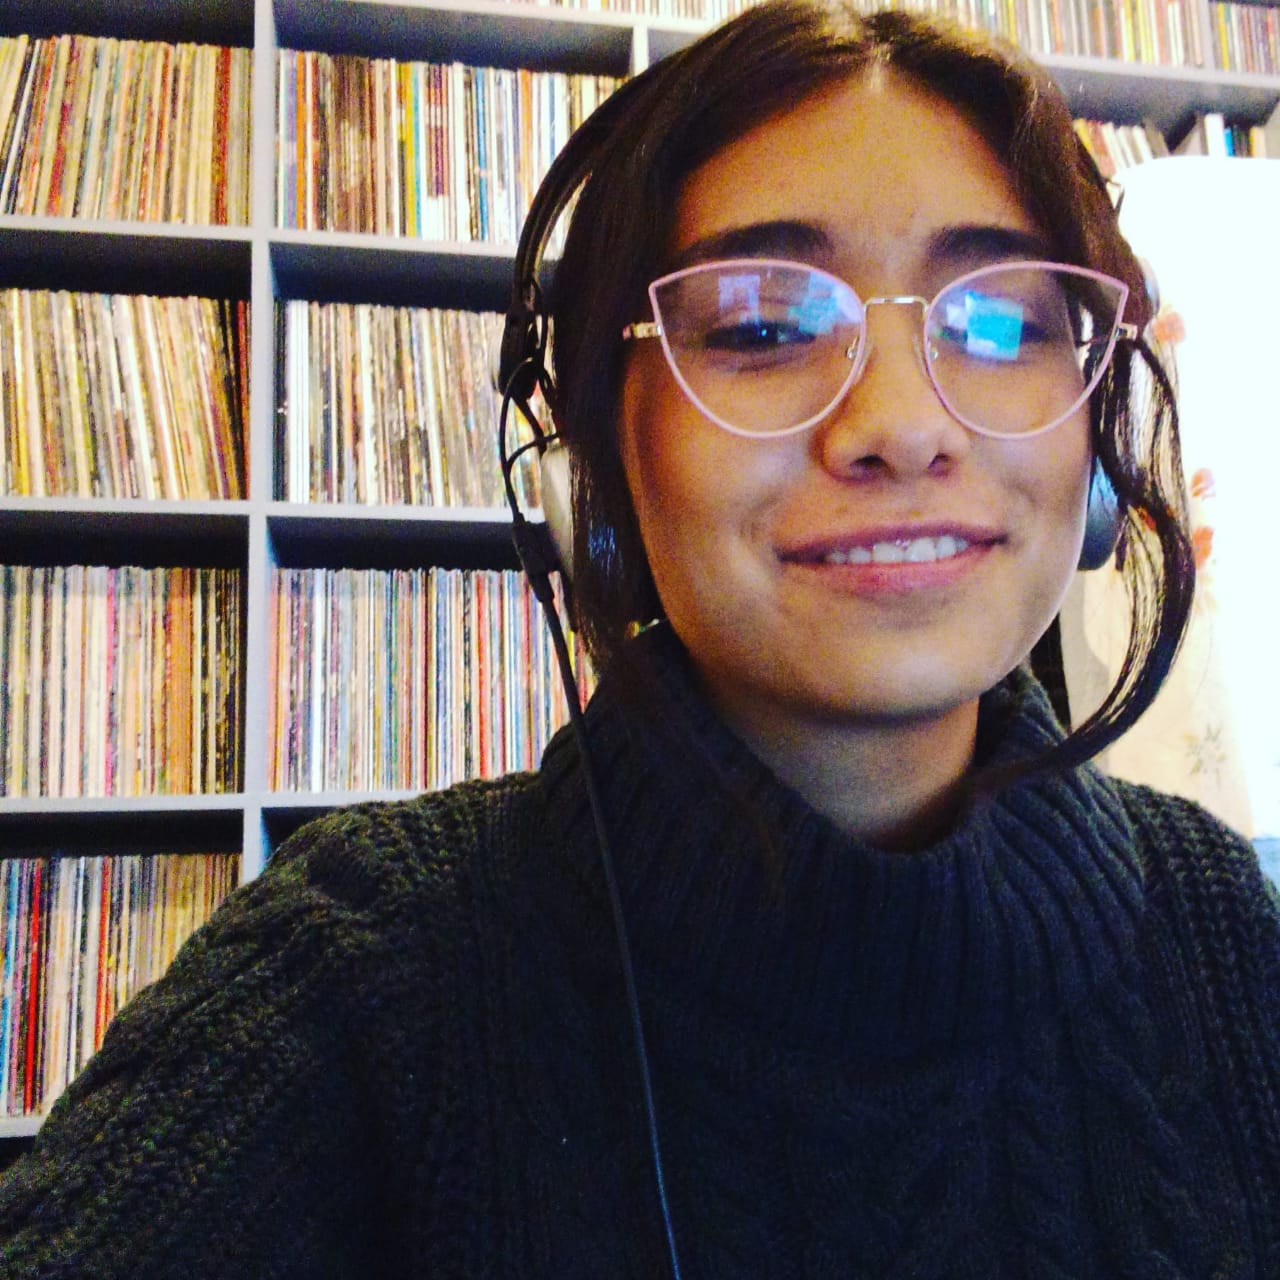 Natalia Mosso